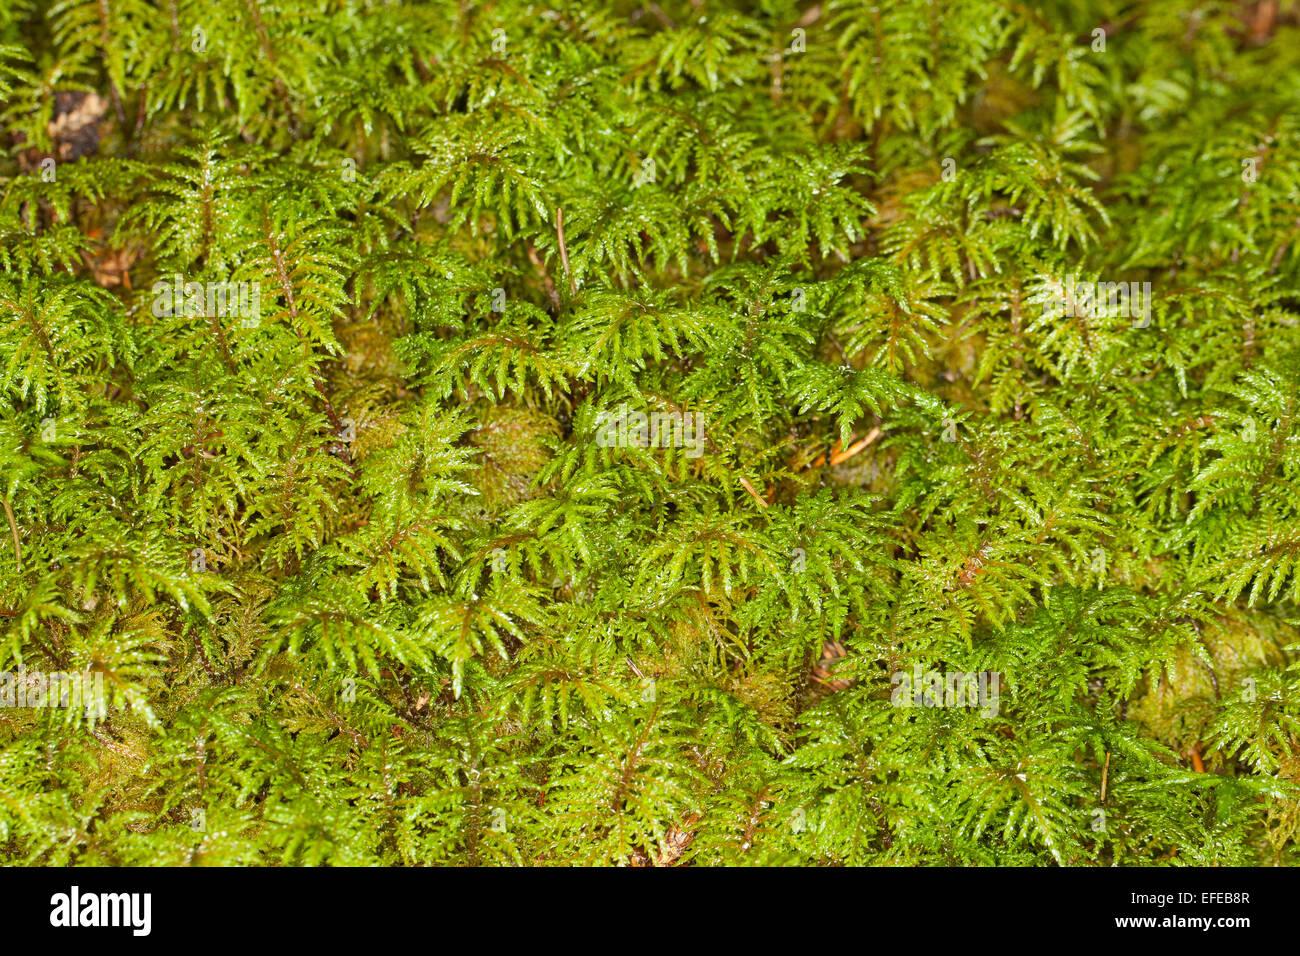 Glittering Wood-moss, Stair-step Moss, Fern Moss, feather moss, Etagenmoos, Hylocomium splendens, Hylocomium proliferum - Stock Image